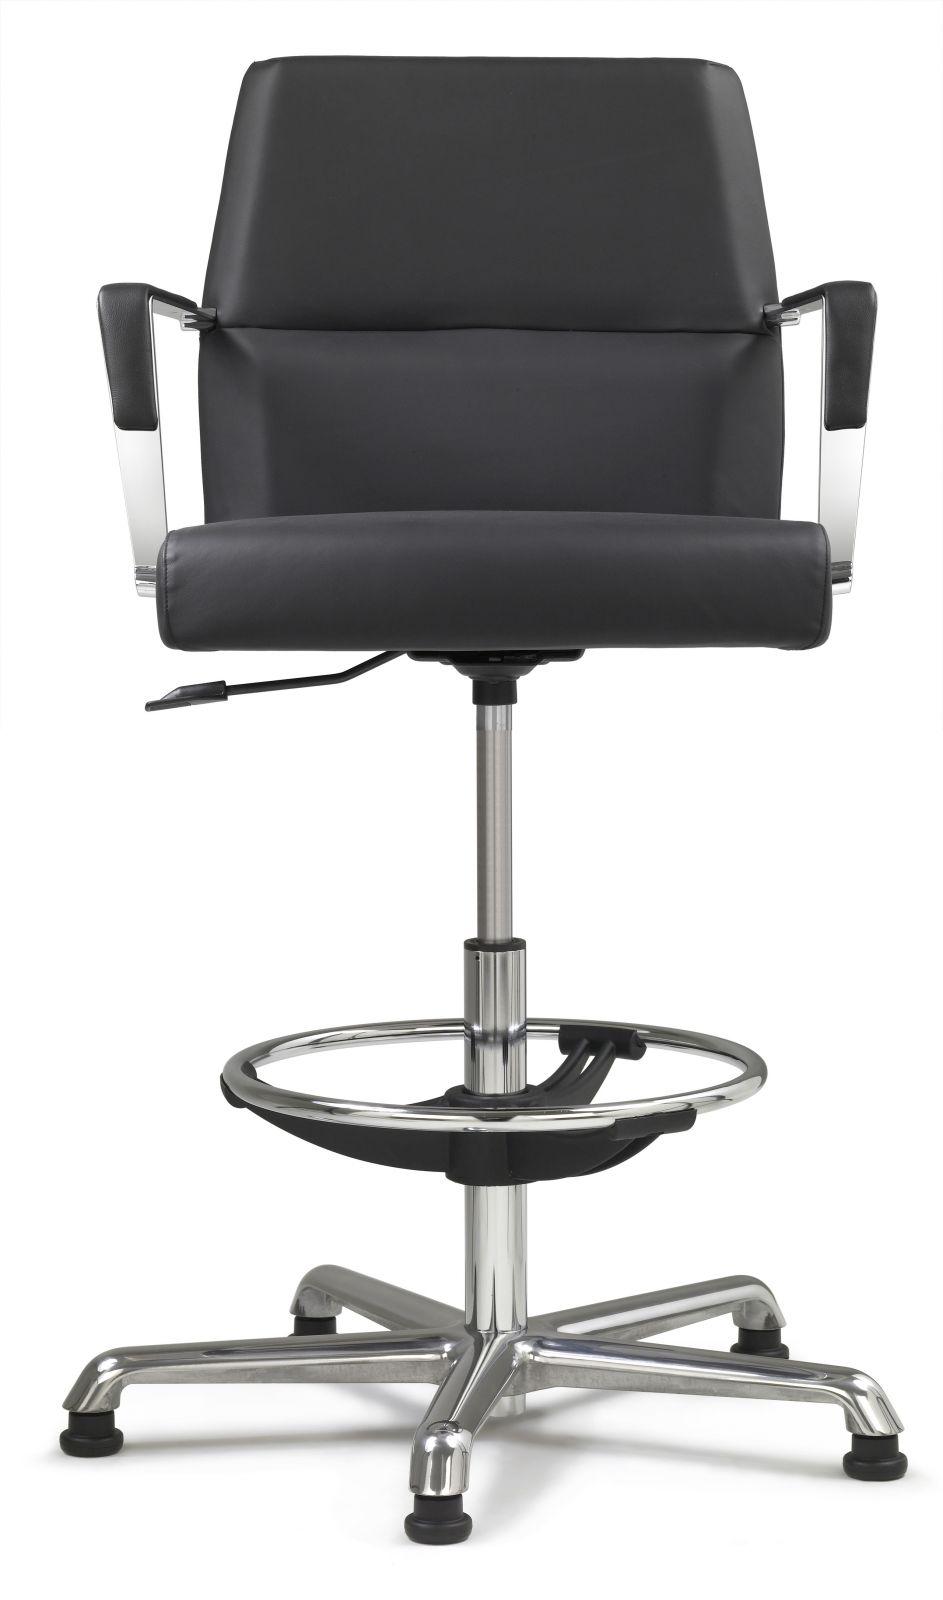 modern-bar-stools-Italian-furniture-large (9).jpg